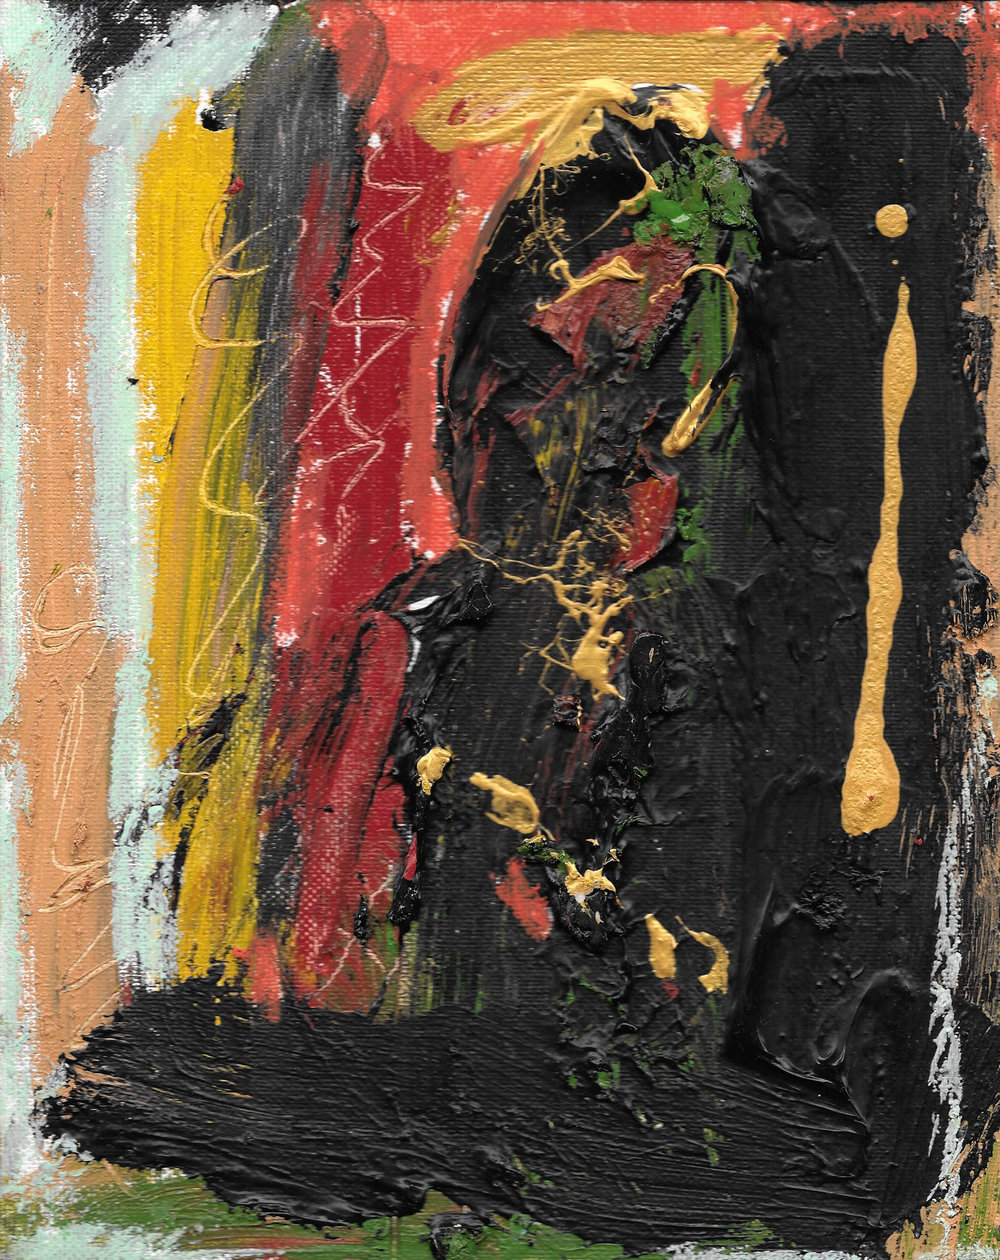 Black Celebration V, 2004